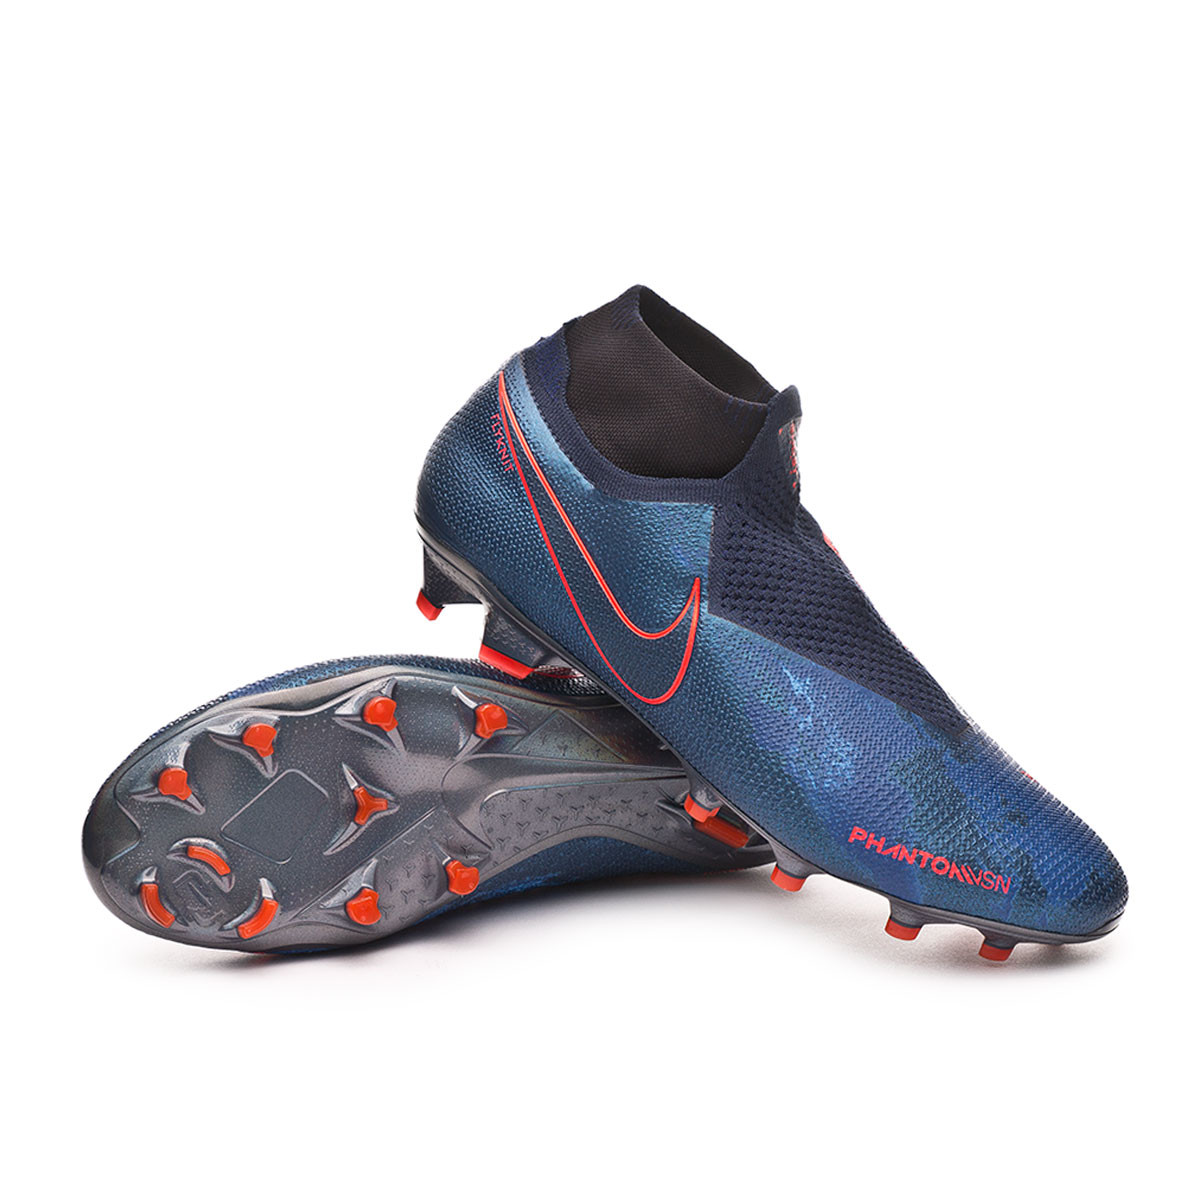 Nike Phantom Vision Elite DF FG Boot. Obsidian-Black-Blue void ... ec7d14f11